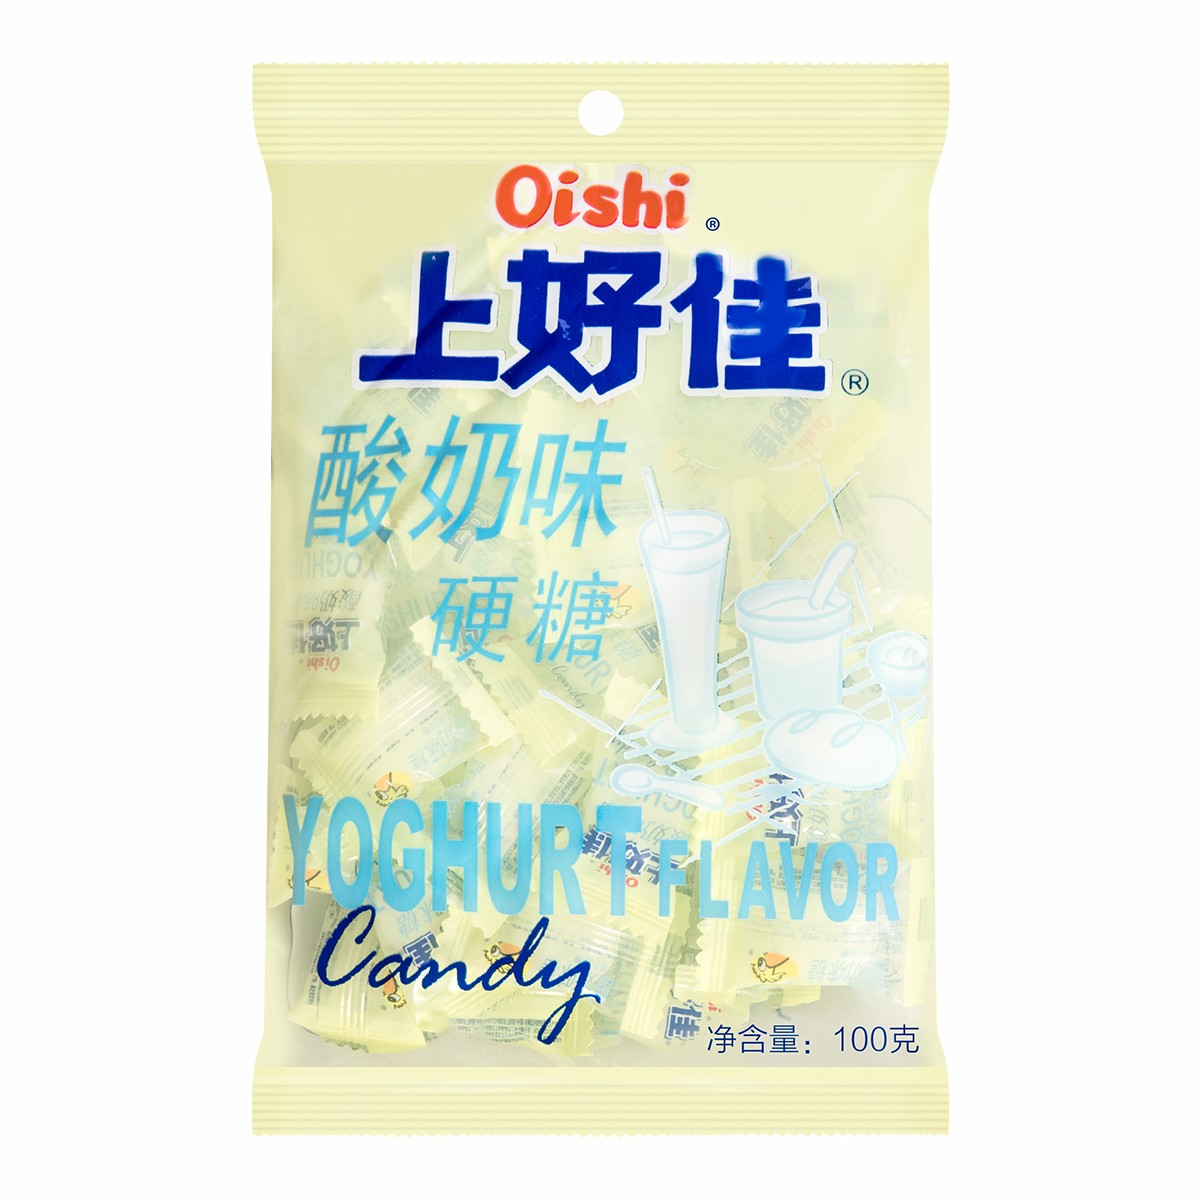 OISHI上好佳 酸奶味 硬糖 100g